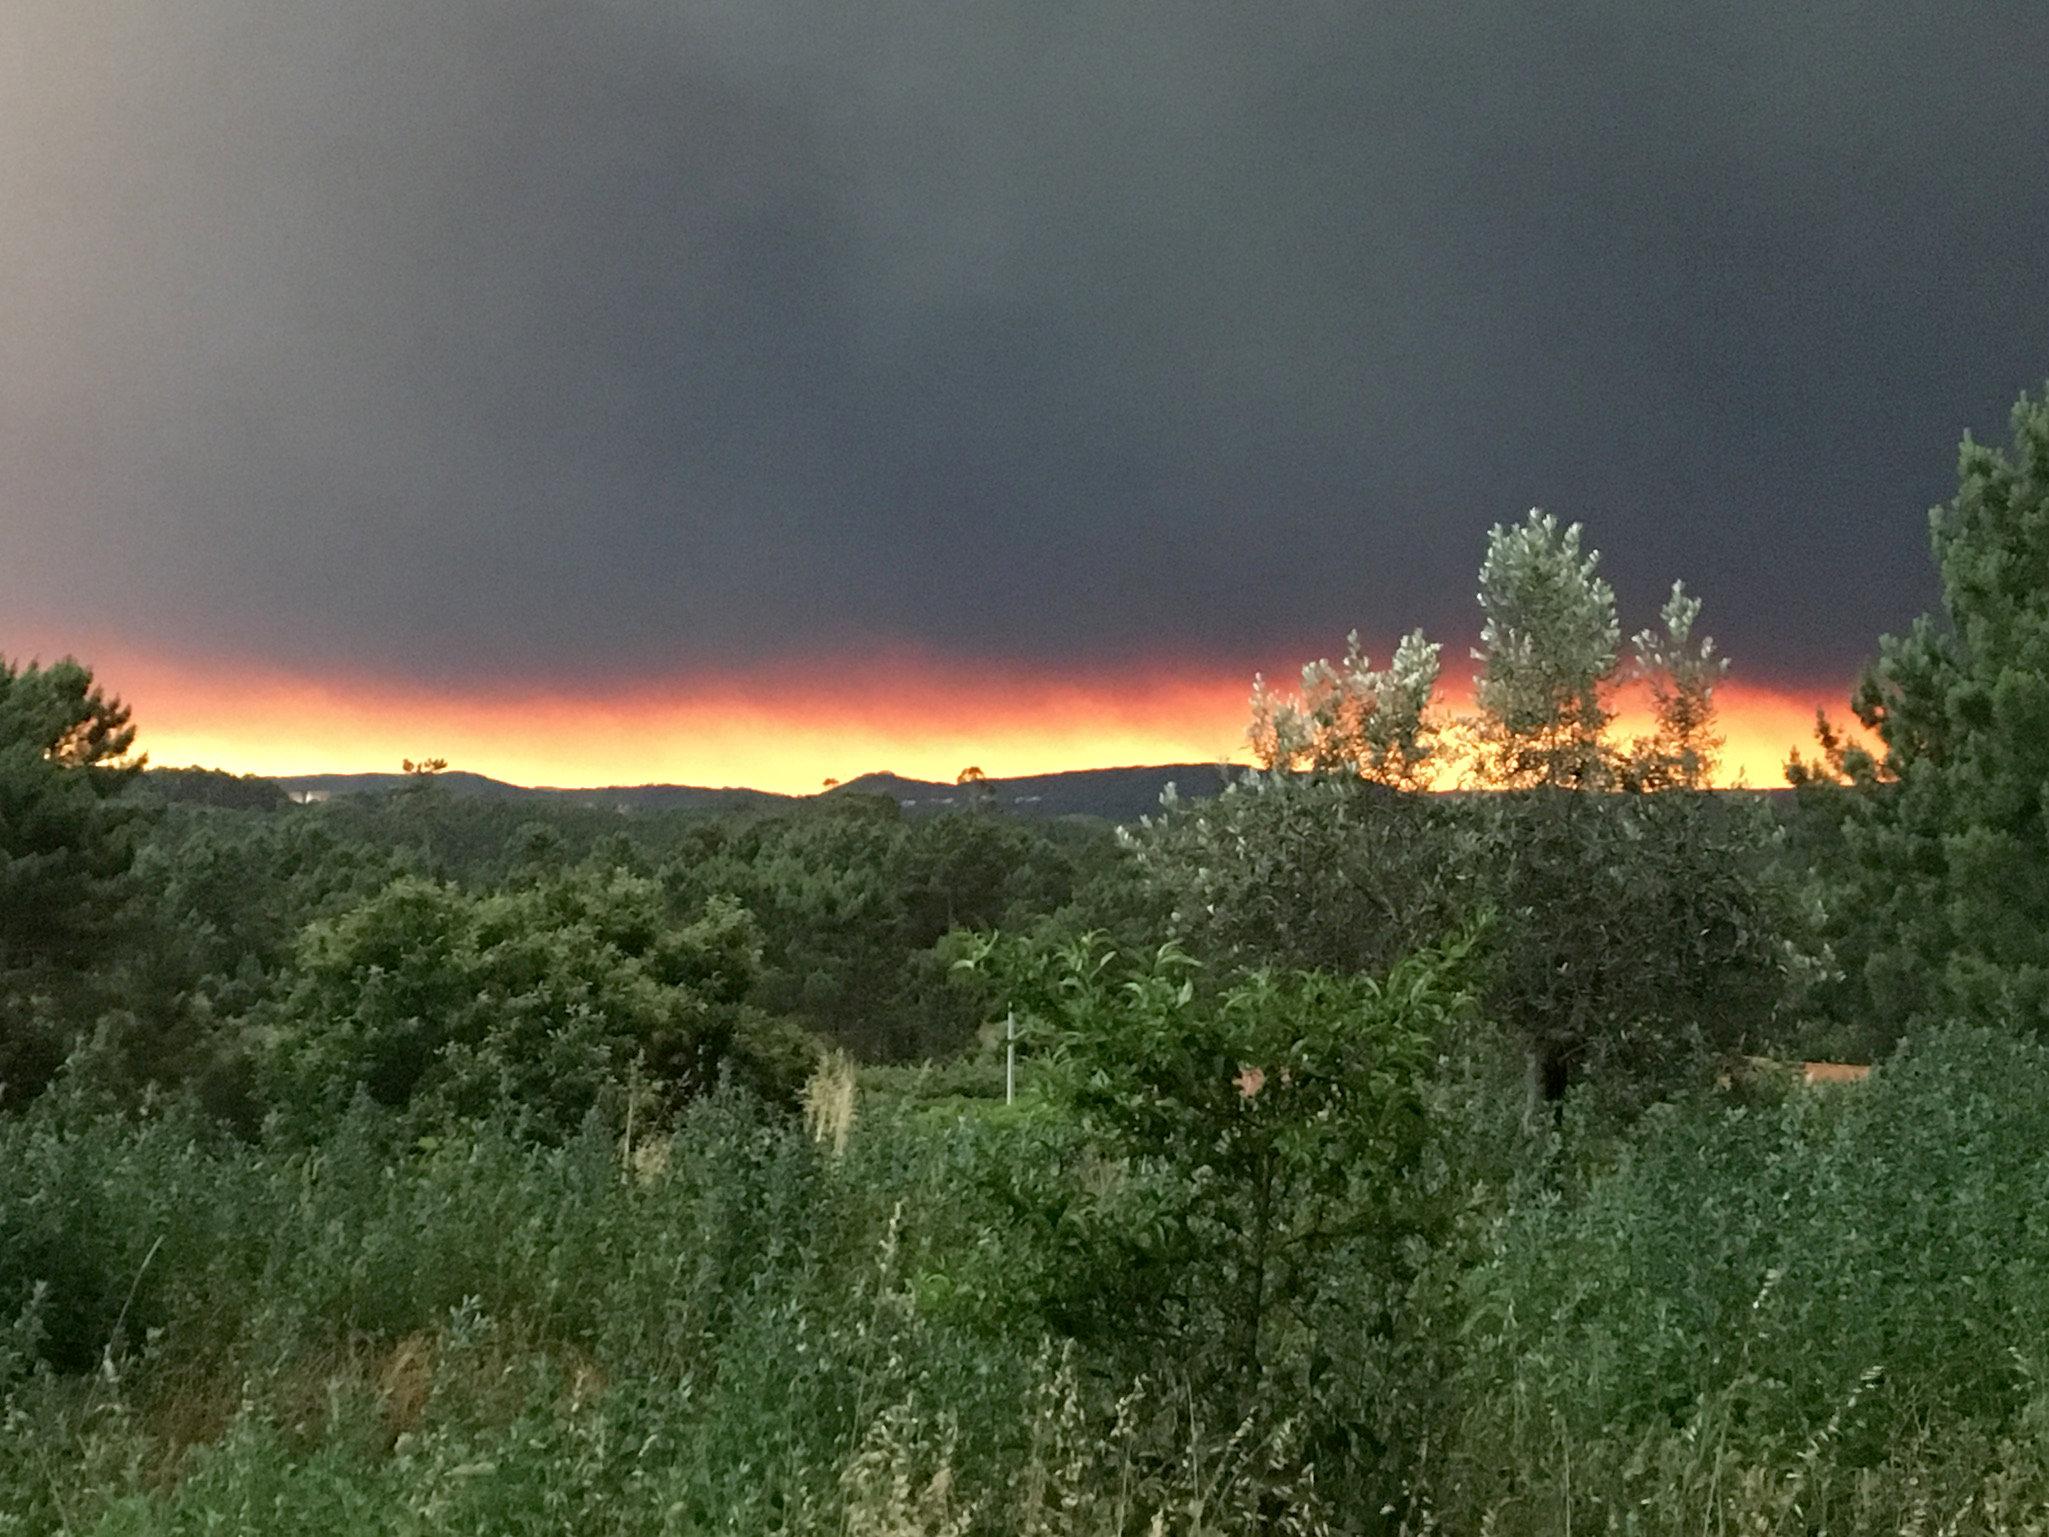 2017-06-18T005232Z 1996045150 RC1B2AE16210 RTRMADP 3 PORTUGAL-FIRE